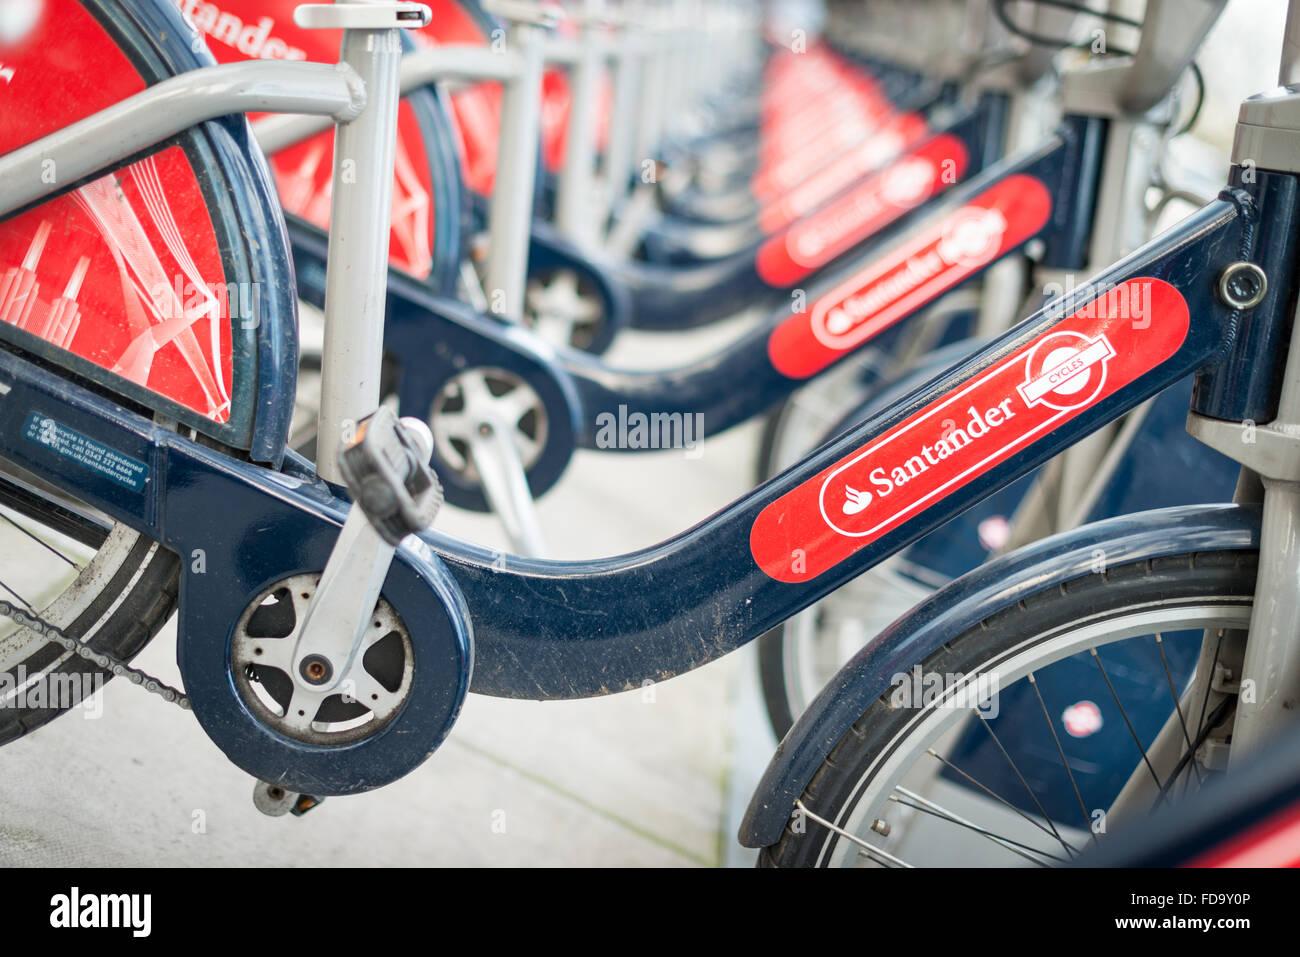 Santander Hire bikes, Boris Bikes or bicycles parked in London UK - Stock Image